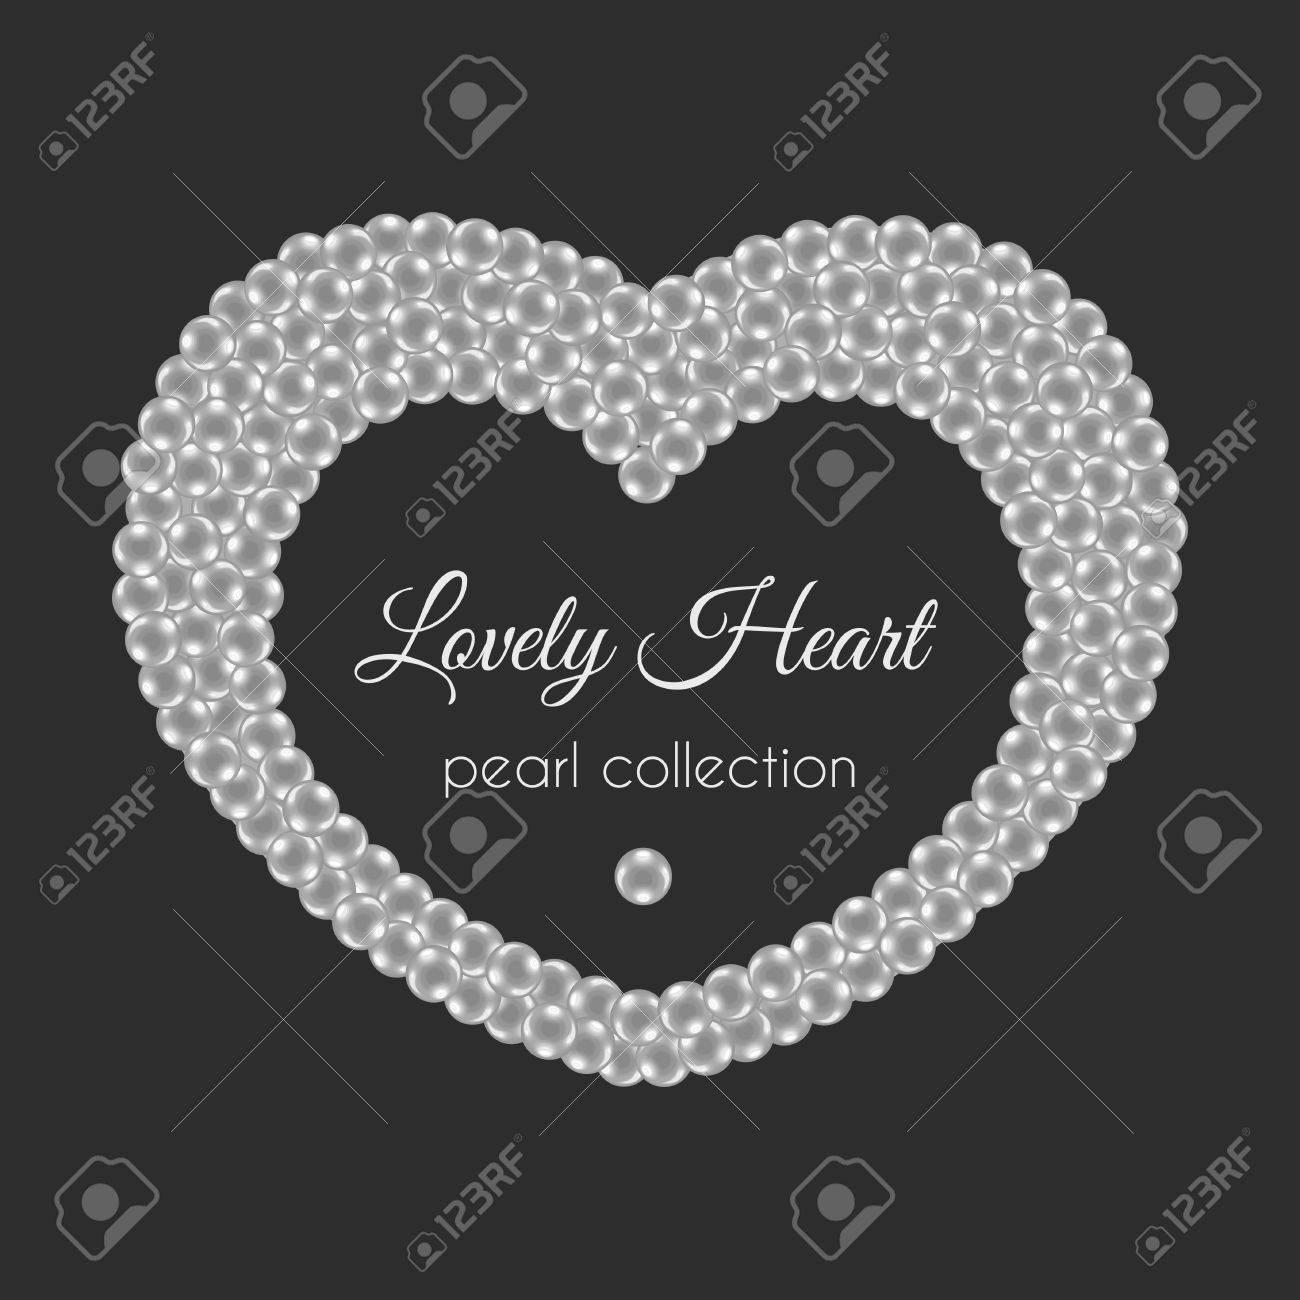 Perle Herz. Rahmen In Herzform. Weiße Perlen-Design. Dekorative ...